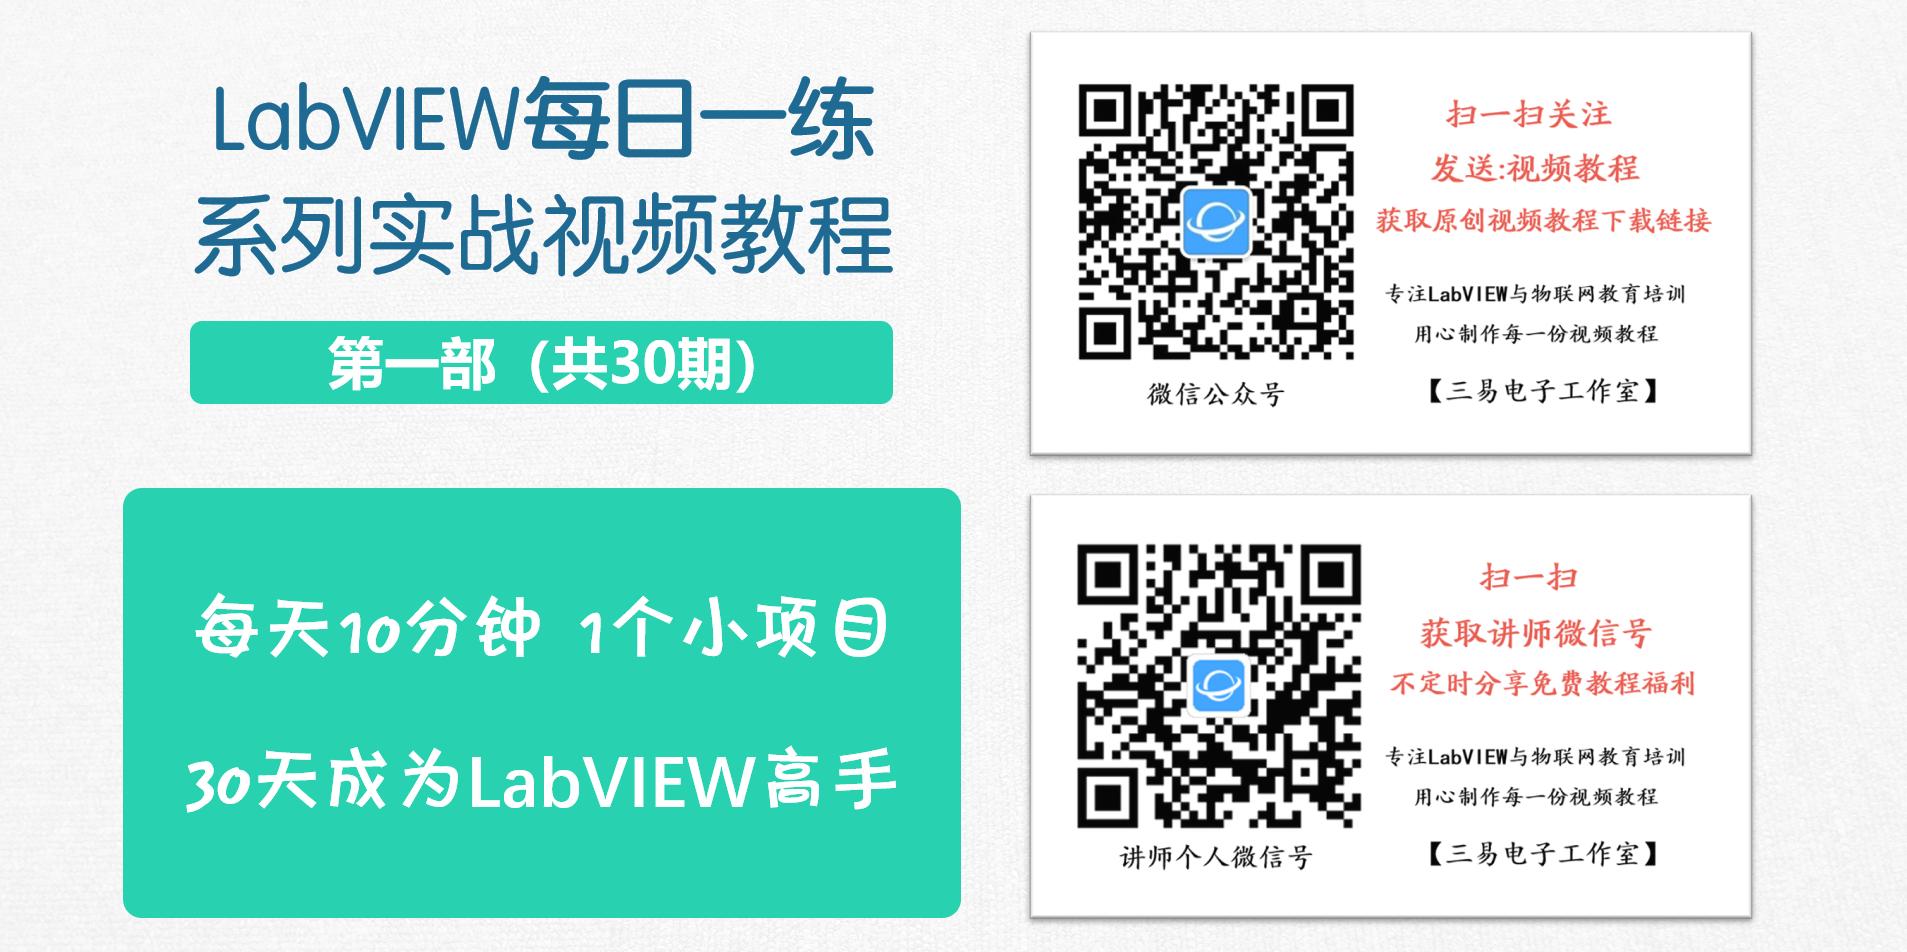 LabVIEW每日一練 系列實戰視頻教程【第一部(共30期)】